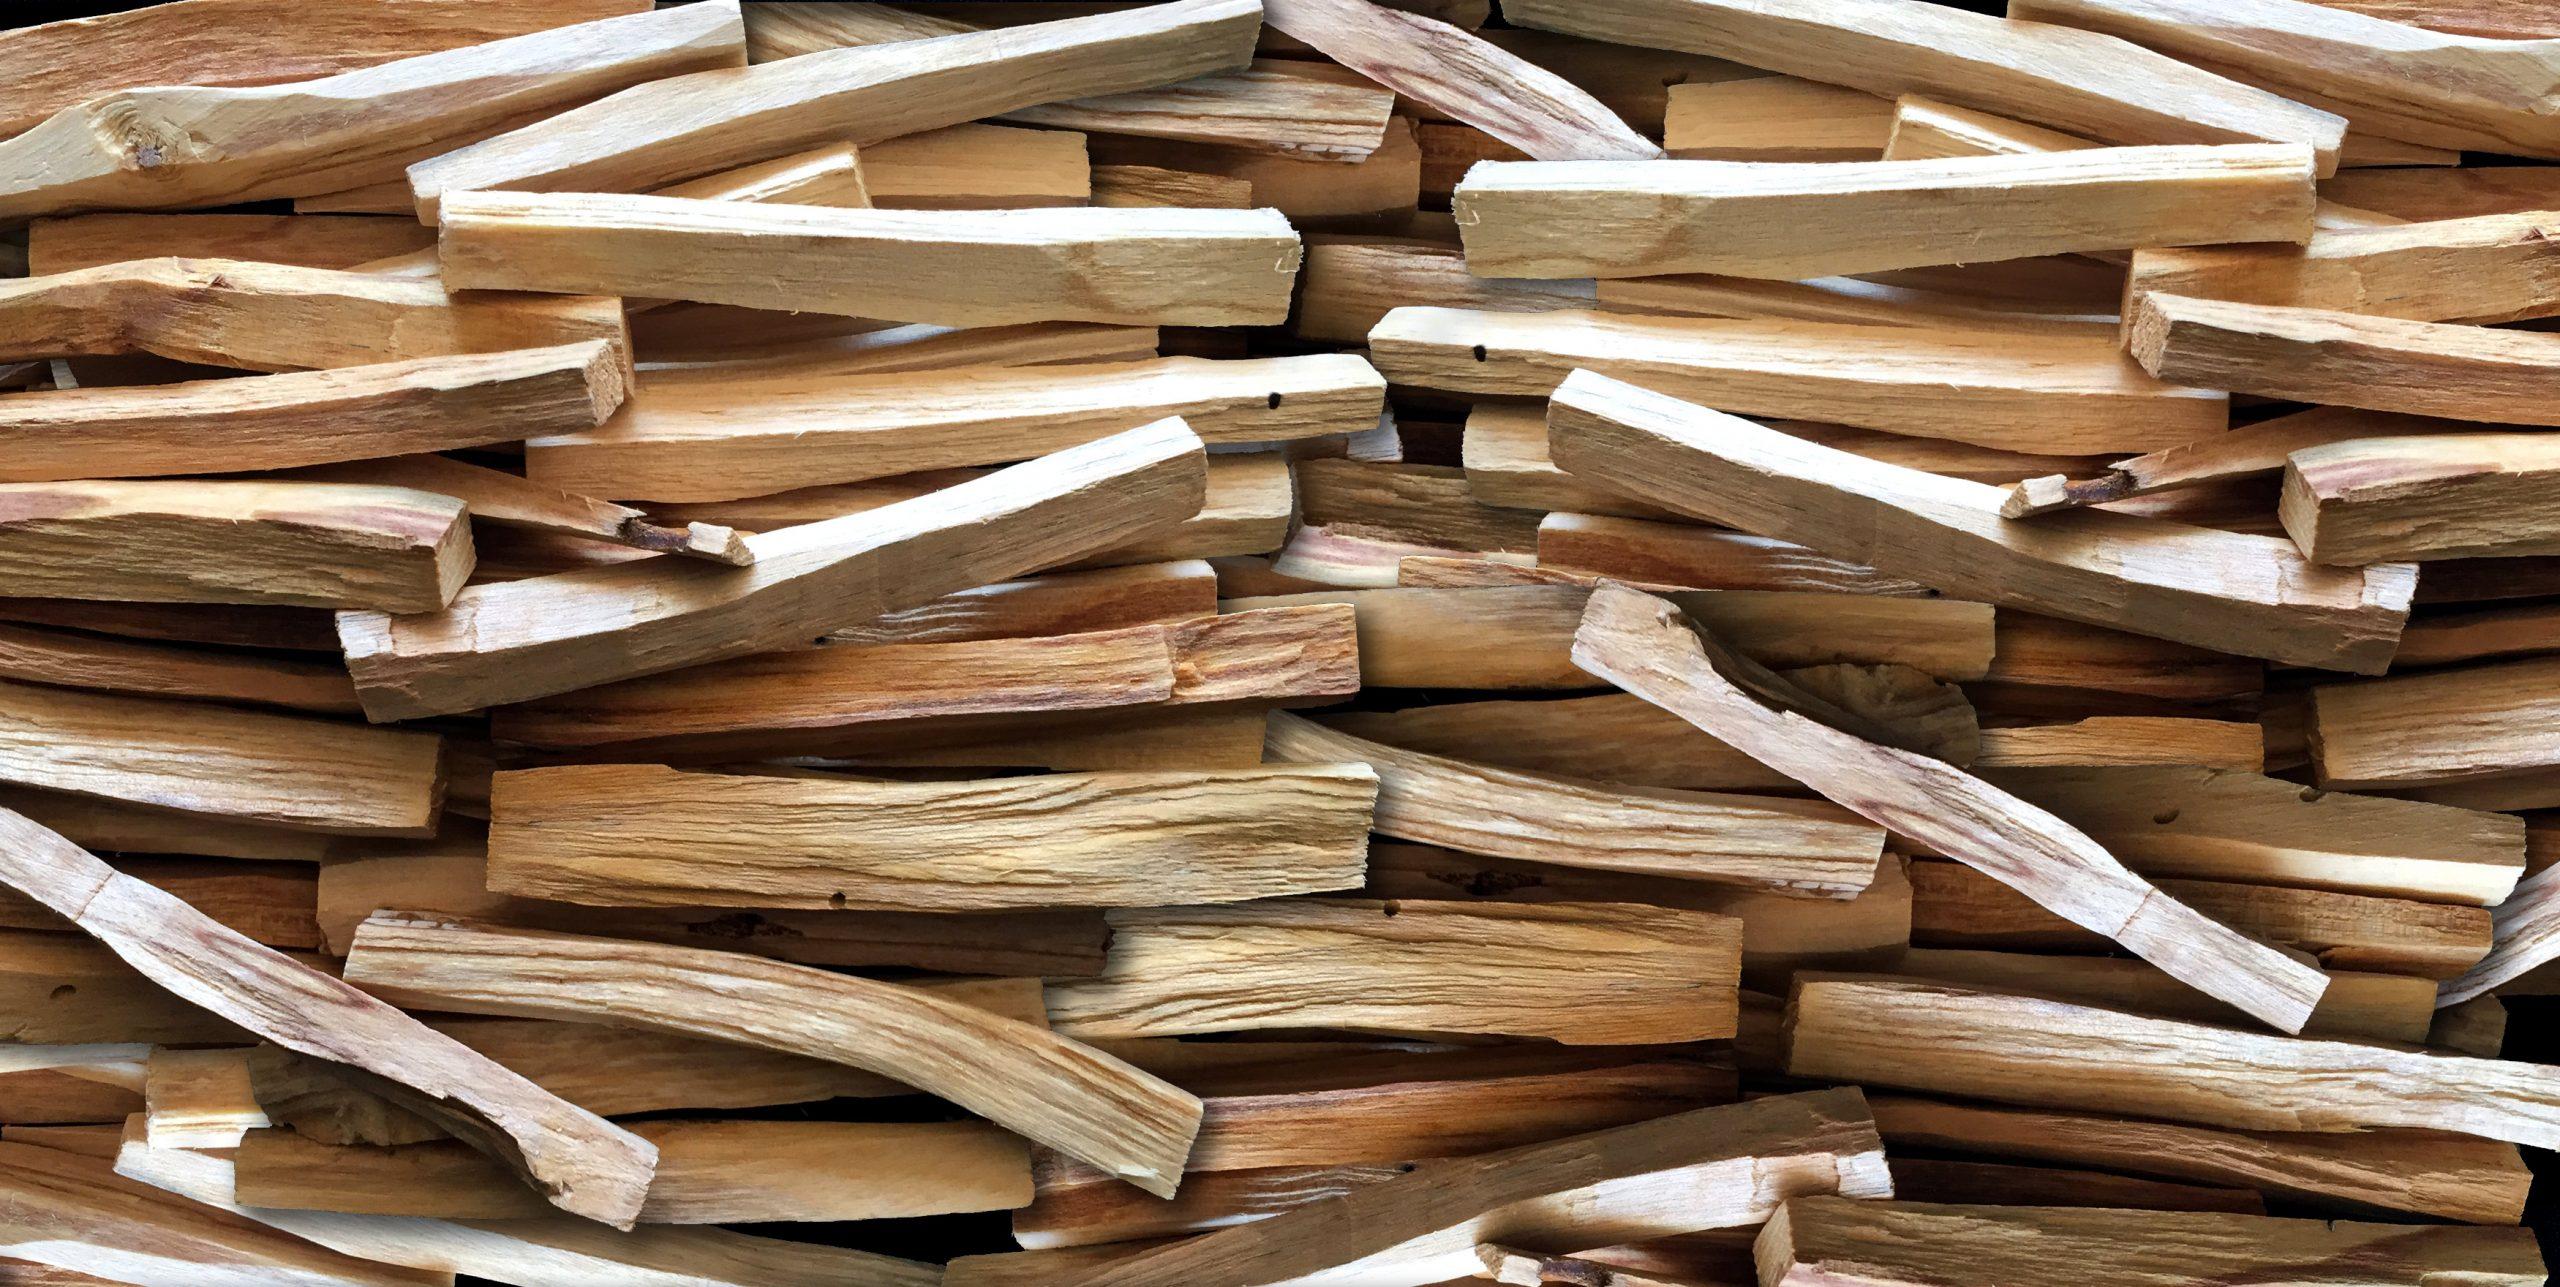 Organic Assorted Palo Santo Incense Sticks, Powder, Cones, Wood